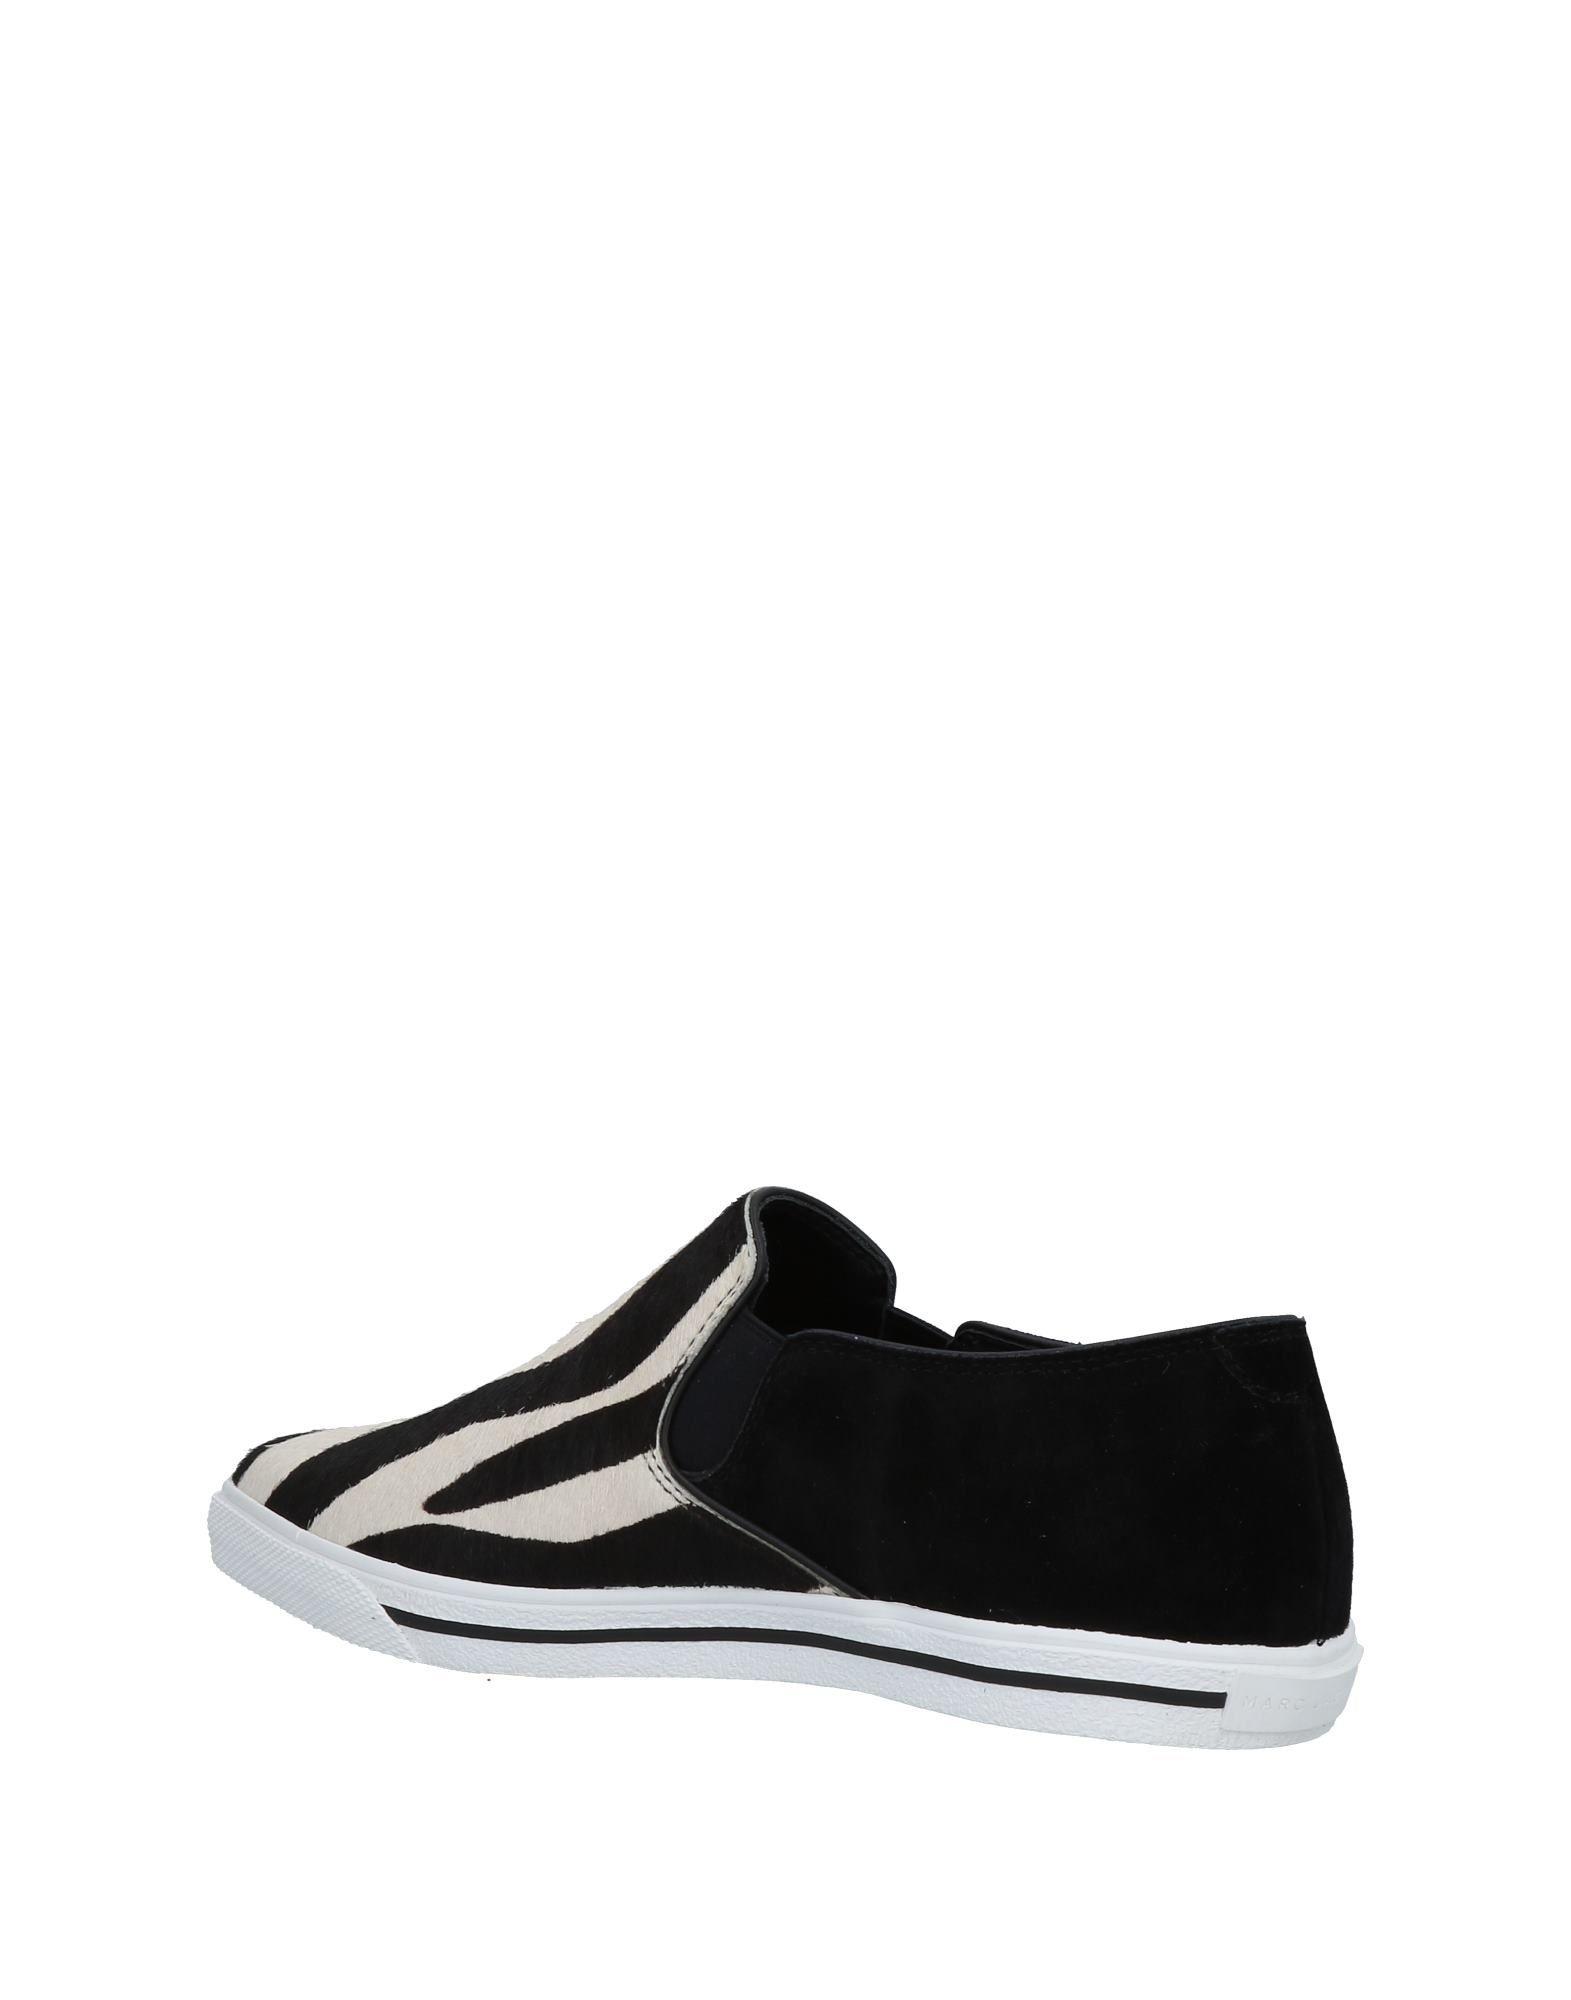 Stilvolle Stilvolle Stilvolle billige Schuhe Marc Jacobs Mokassins Damen  11486633DS 1be434